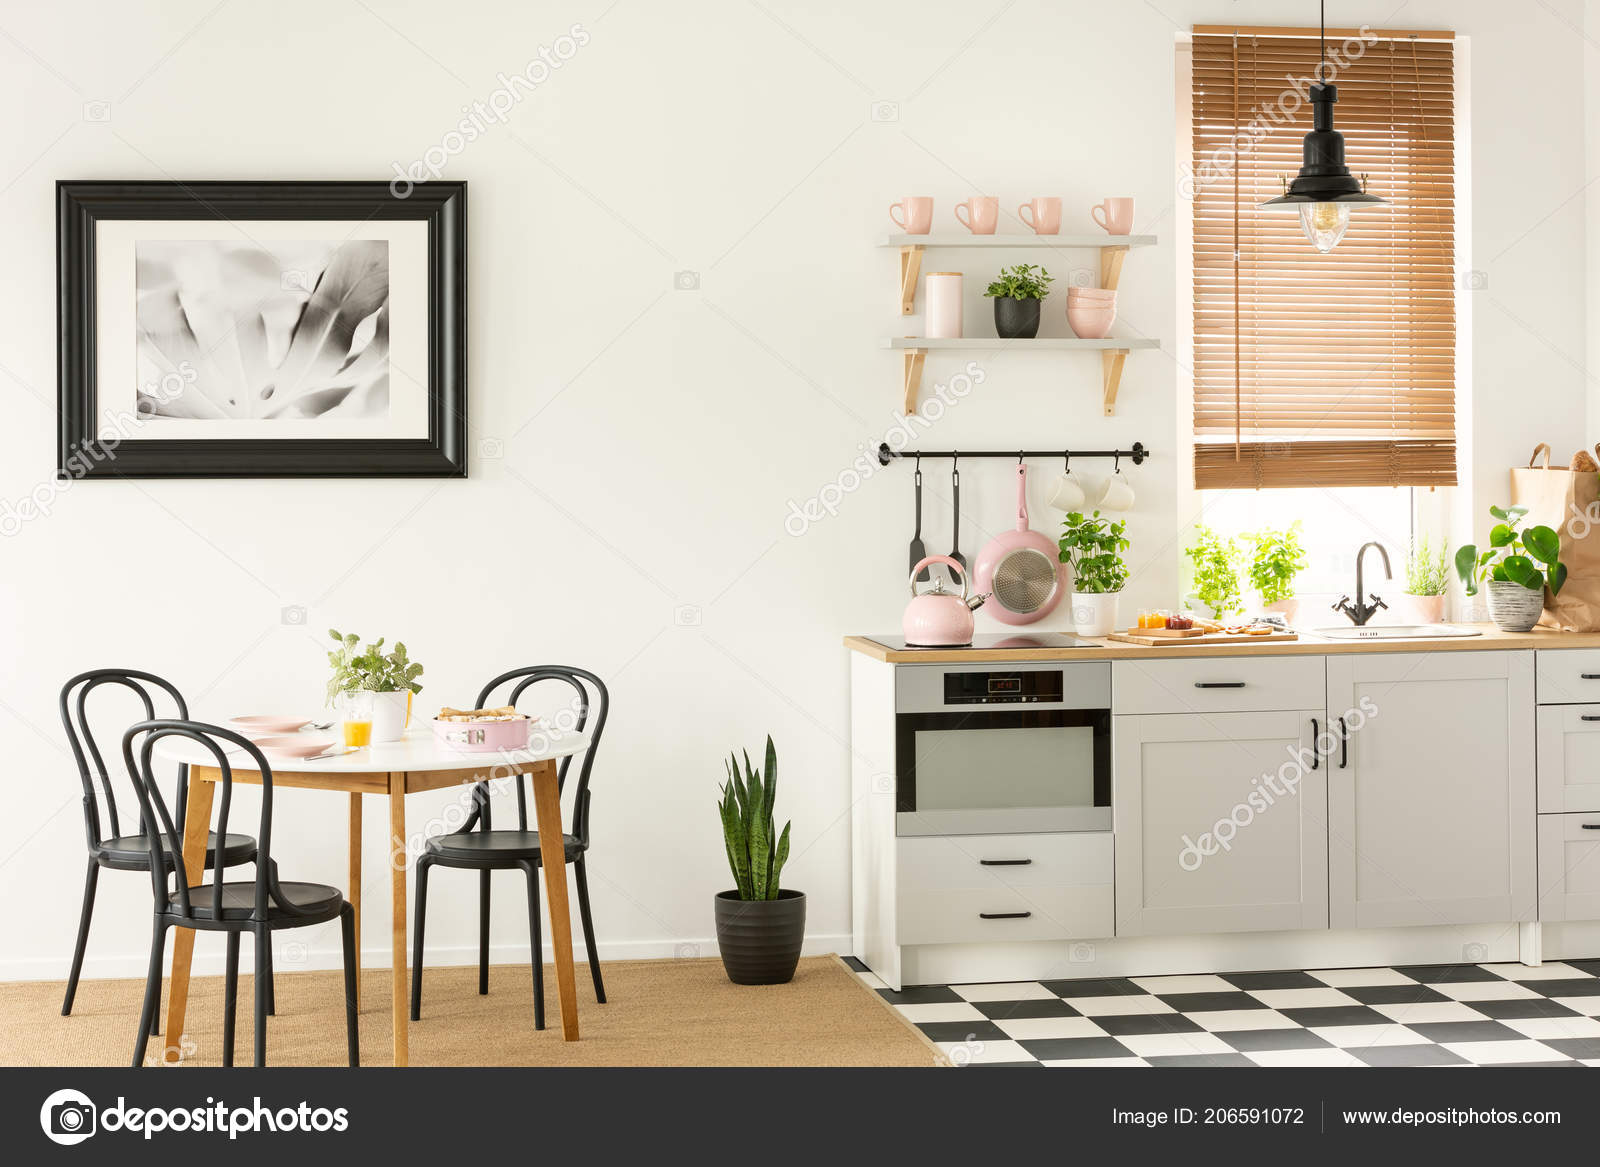 https://st4.depositphotos.com/2249091/20659/i/1600/depositphotos_206591072-stock-photo-painting-black-frame-dining-room.jpg